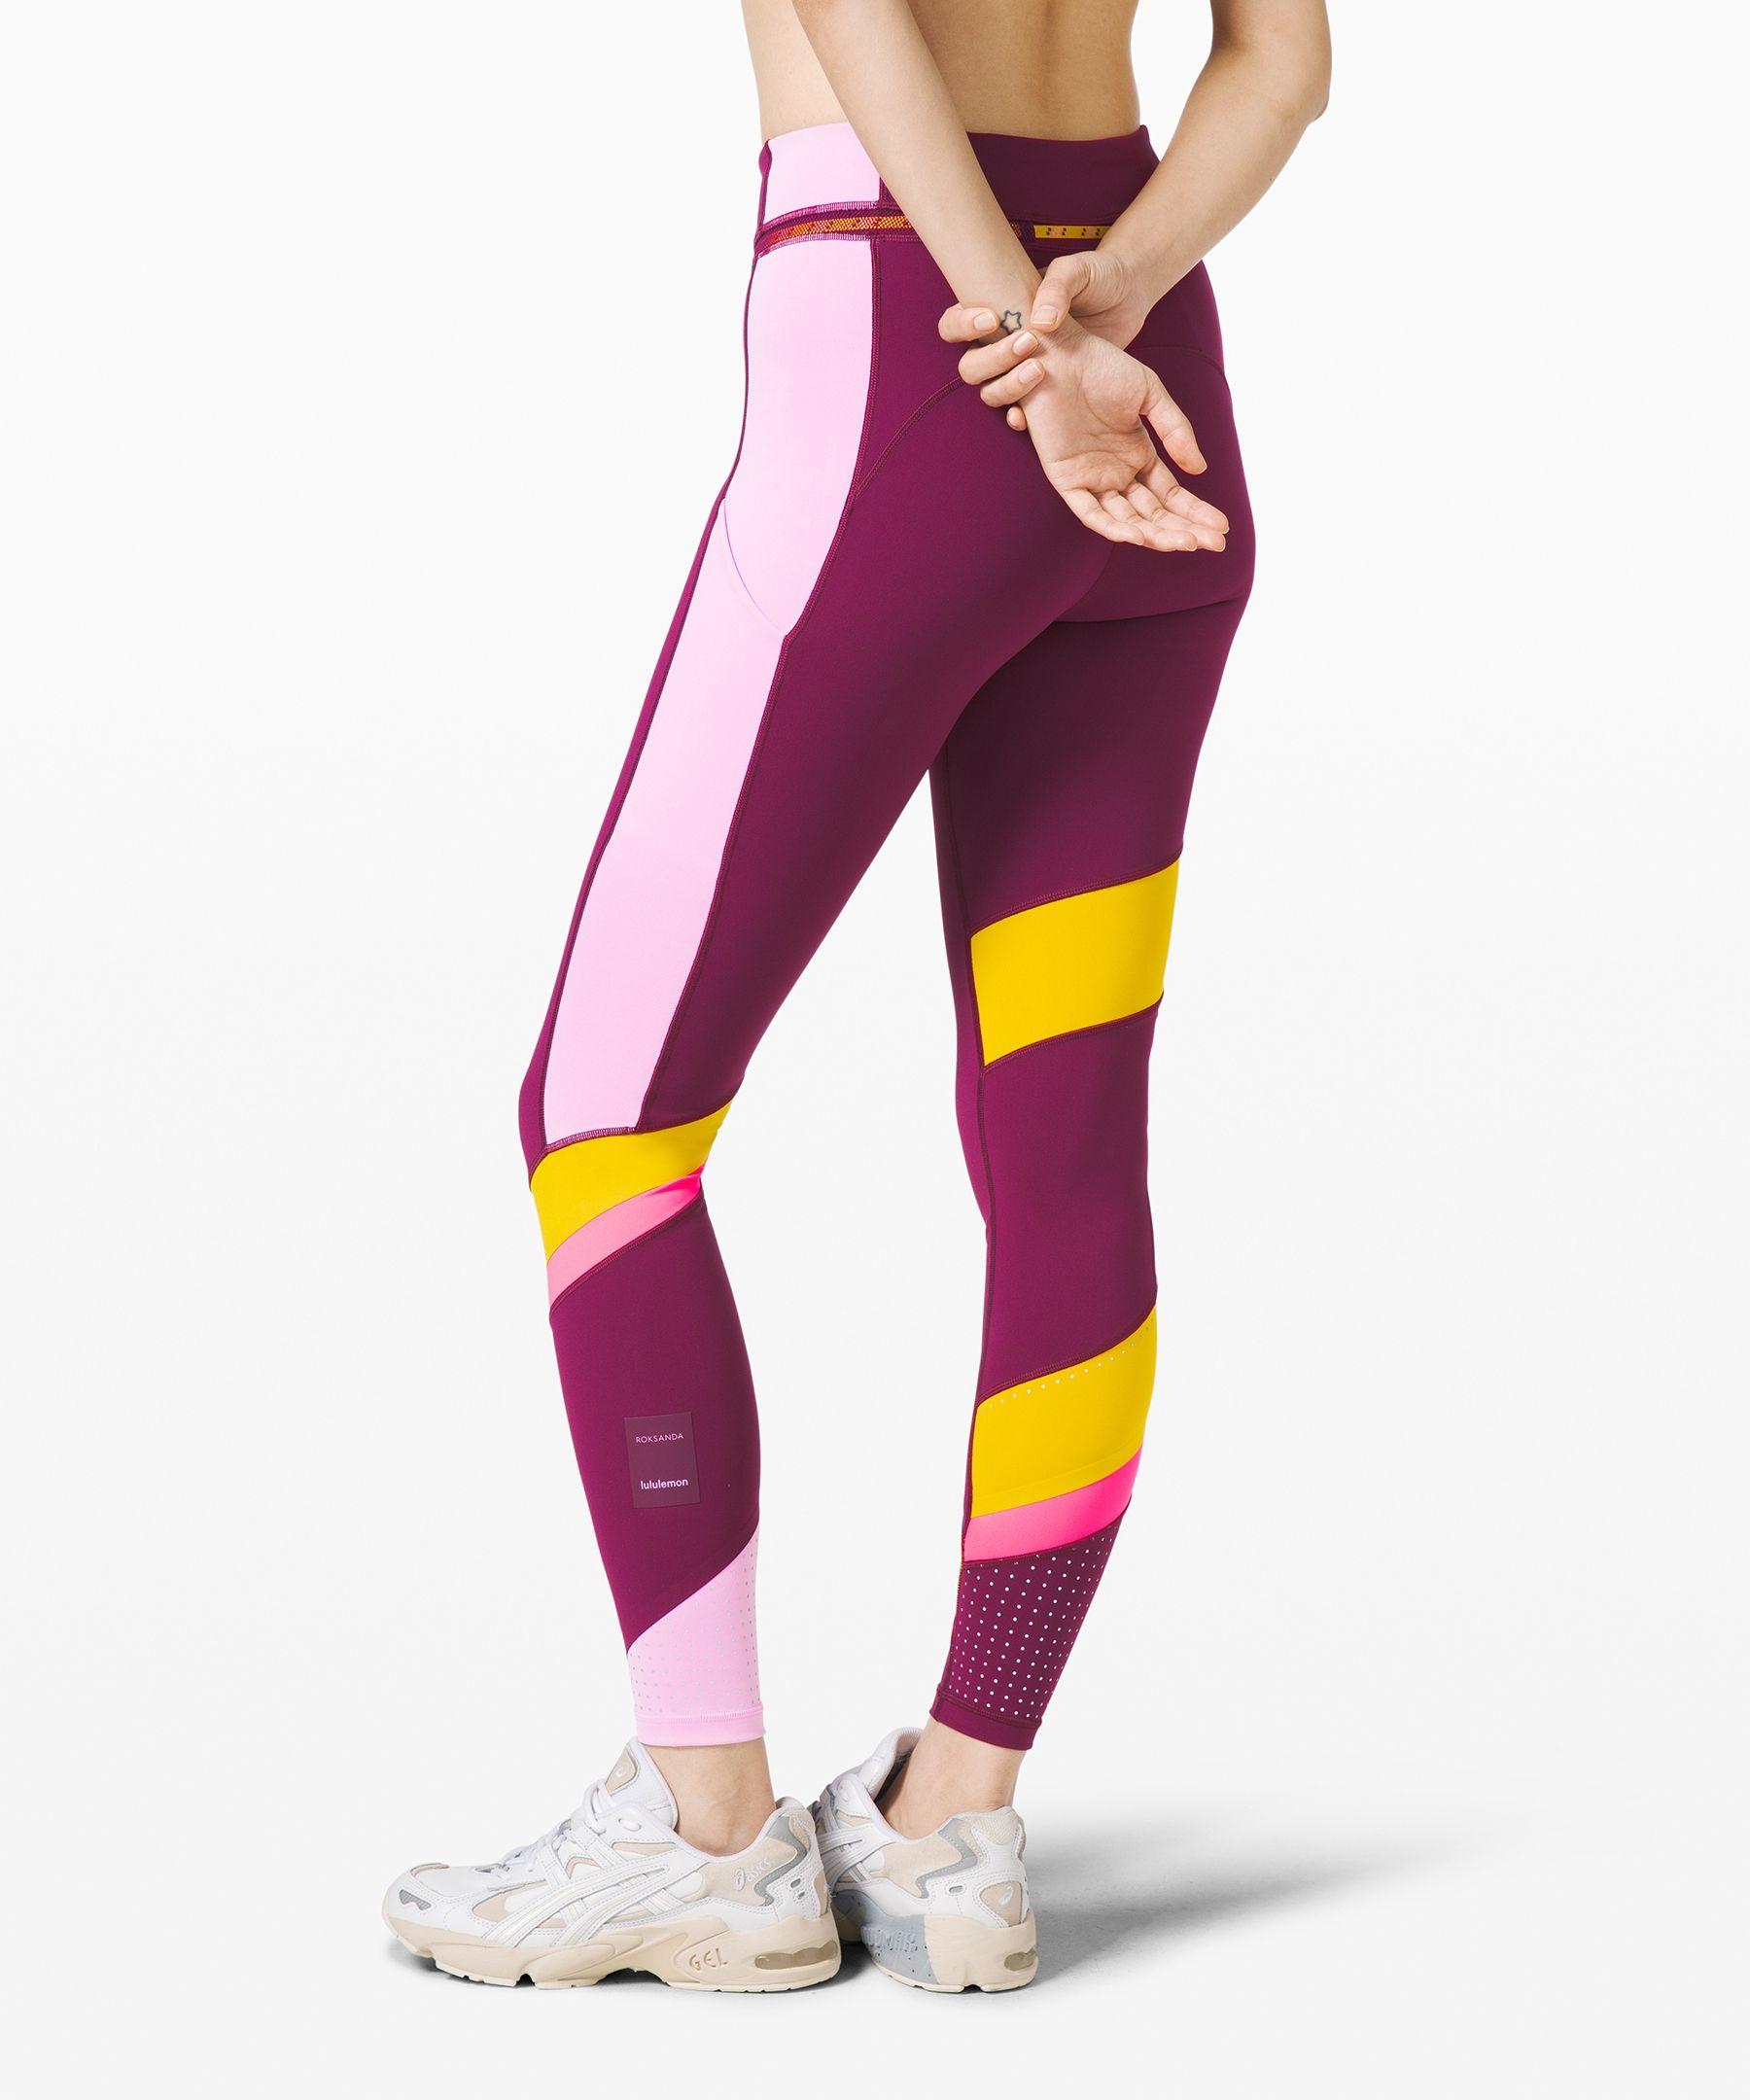 lululemon Women's Break New Ground Legging lululemon X Roksanda, Marvel/Honeycomb/Candy Pink, Size 8 #honeycombcandy